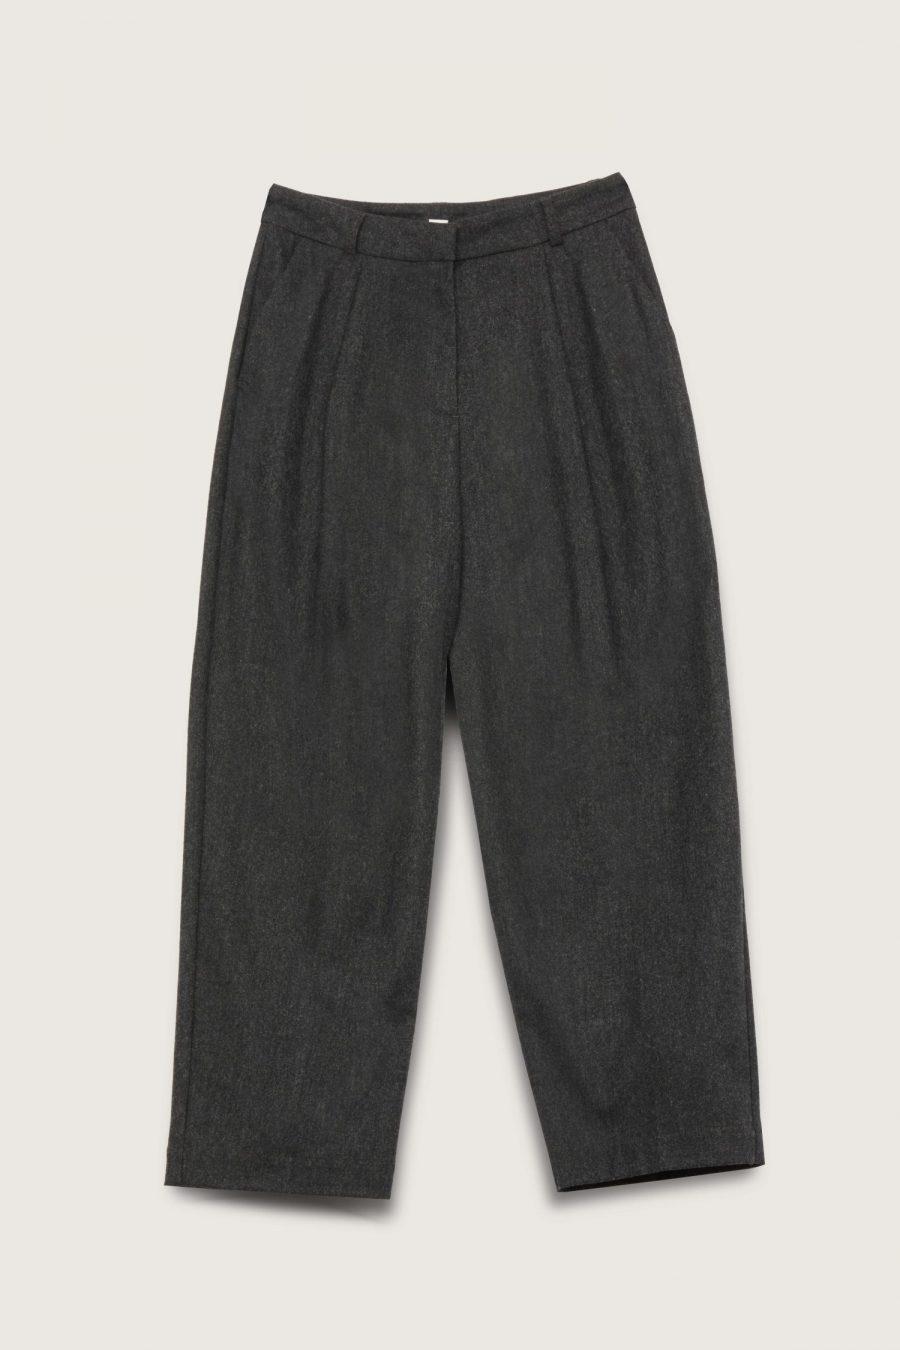 q4pac_market_trouser_charcoal-1500×2250